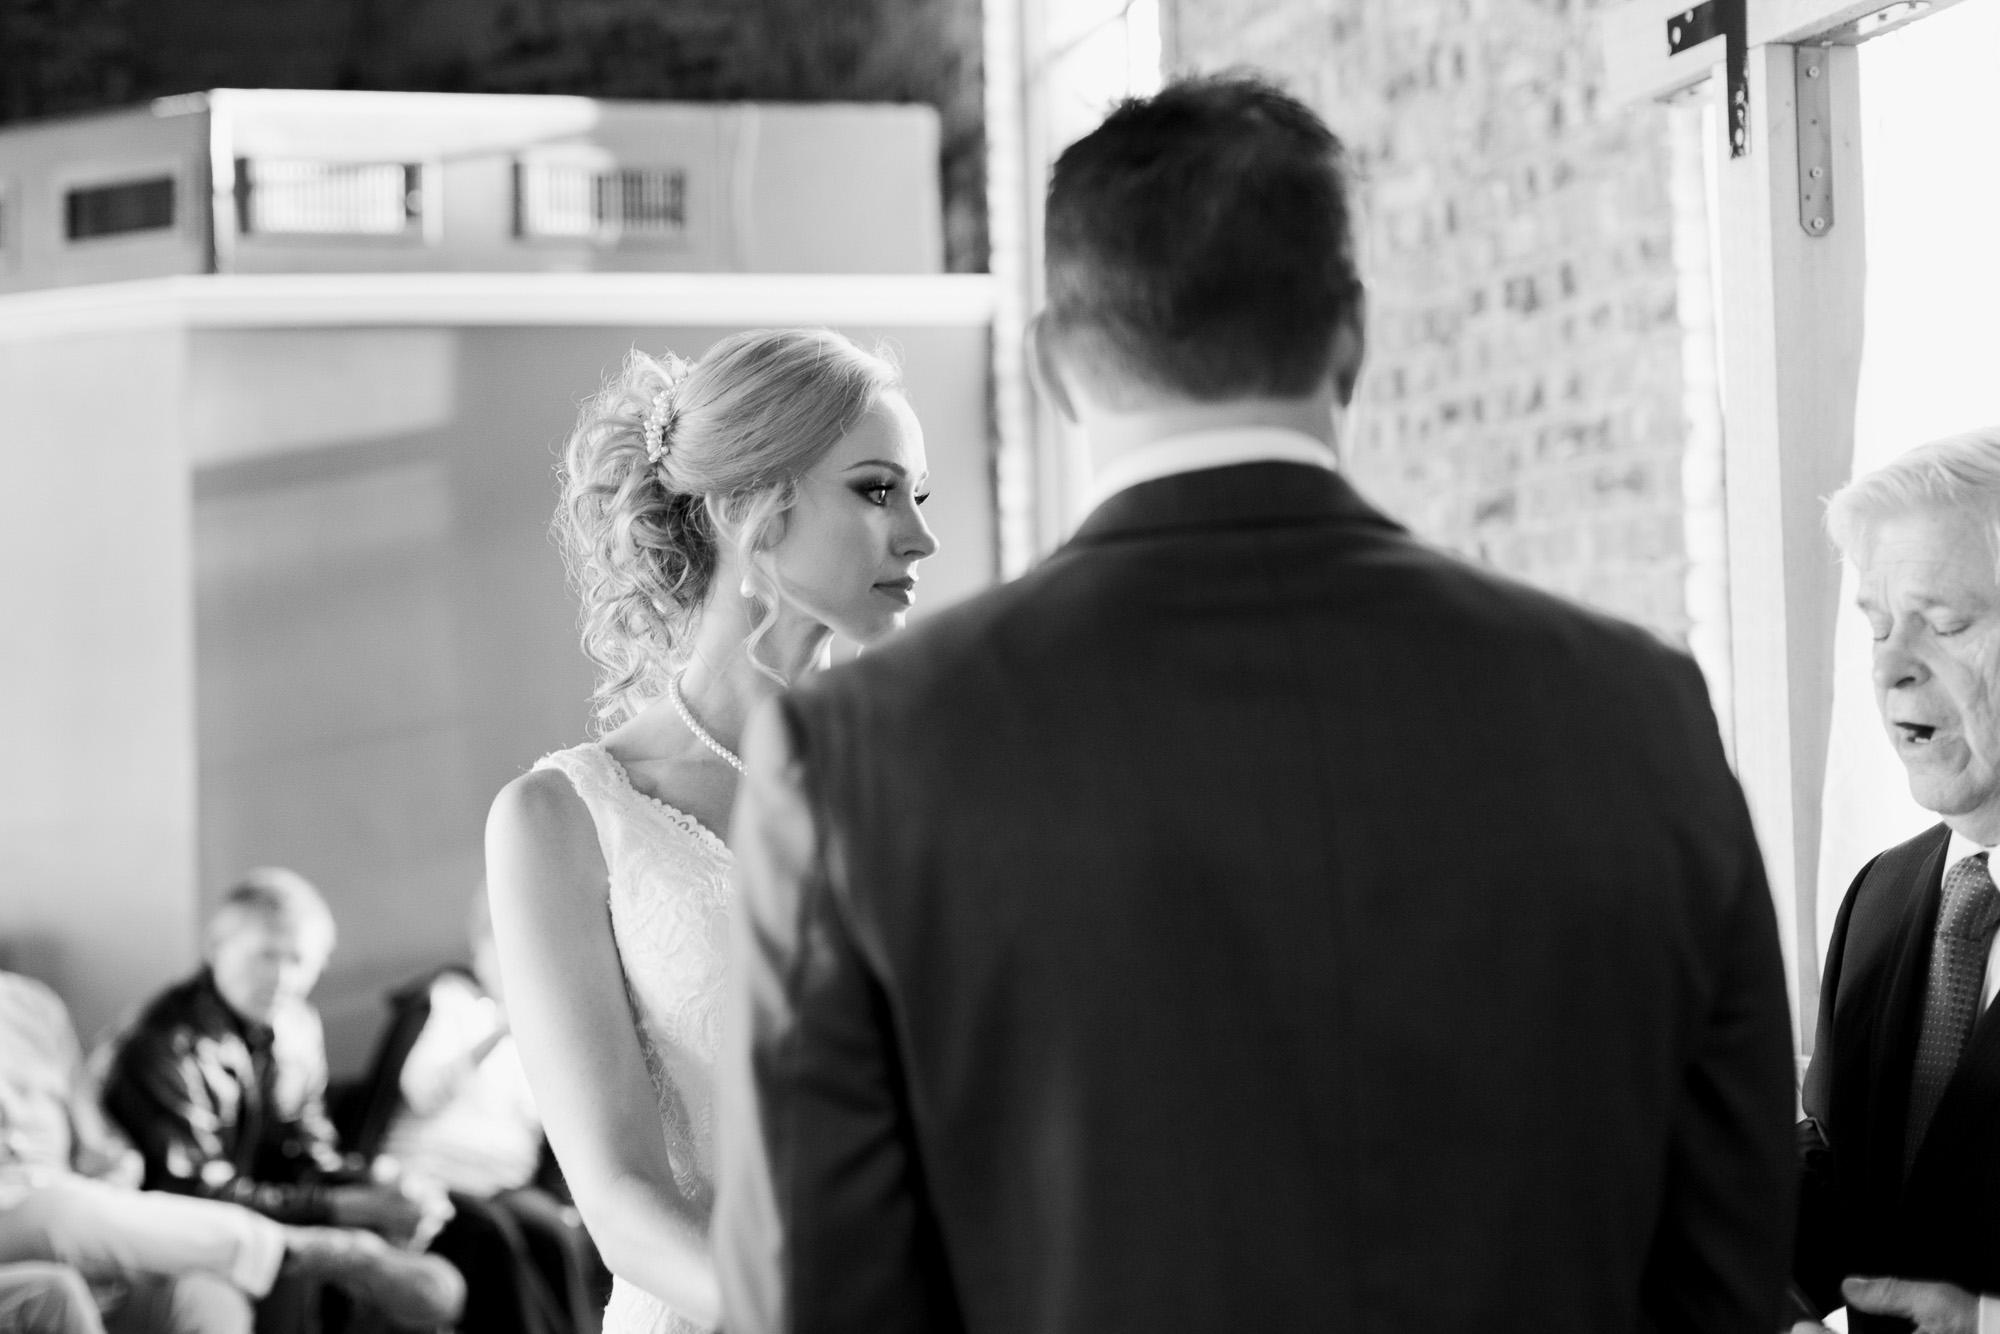 465f2-downtown-bryan-weddingdowntown-bryan-wedding.jpg